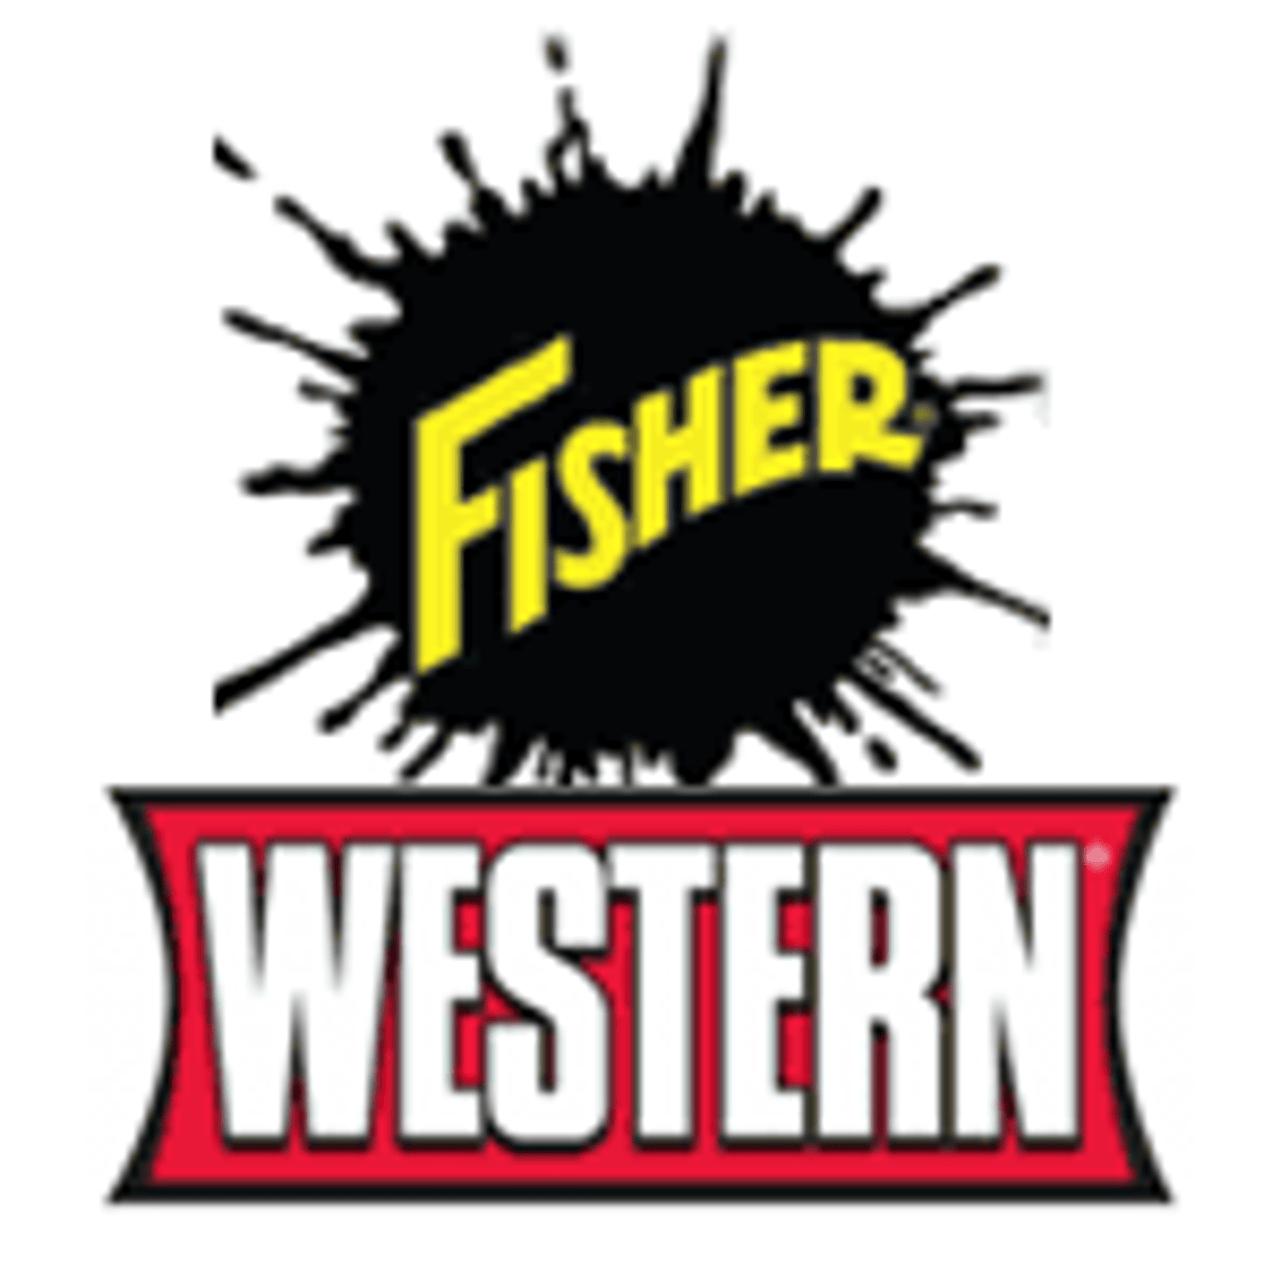 50668 - FISHER WESTERN  PIVOT BOLT